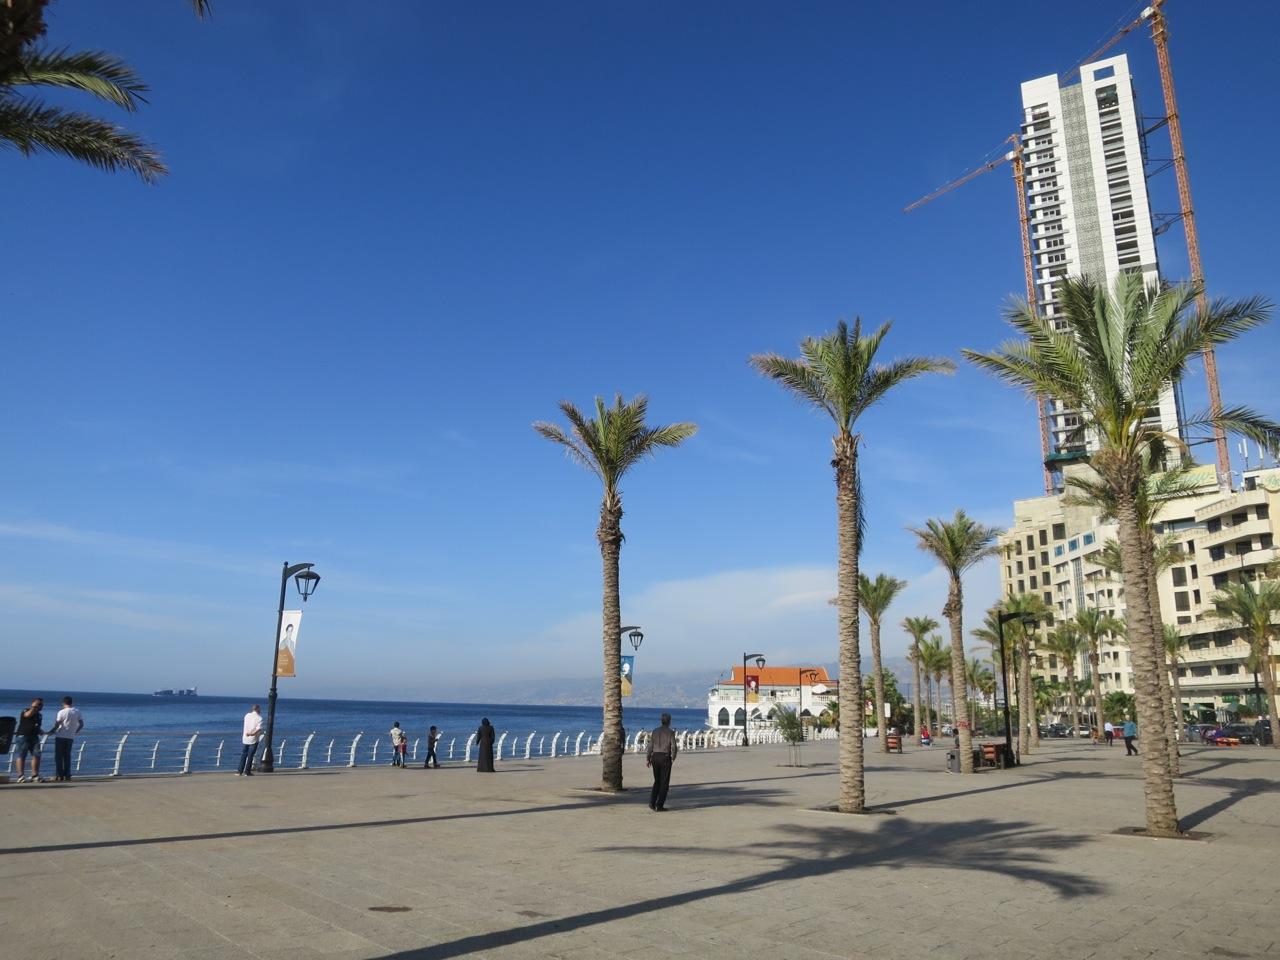 Beirute 2-05